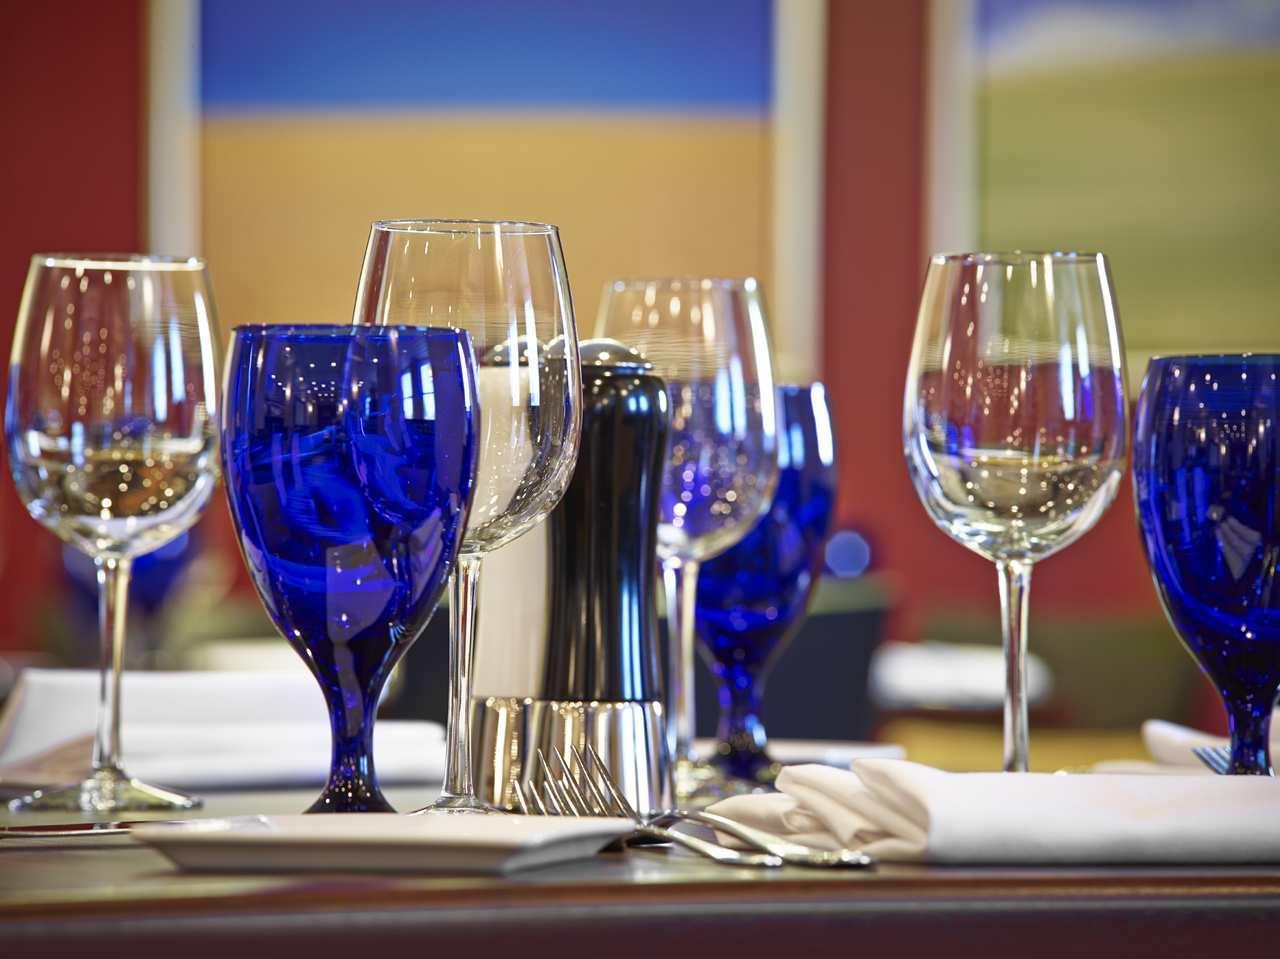 DoubleTree by Hilton Hotel West Edmonton in Edmonton: Stages Bar Wine Glasses